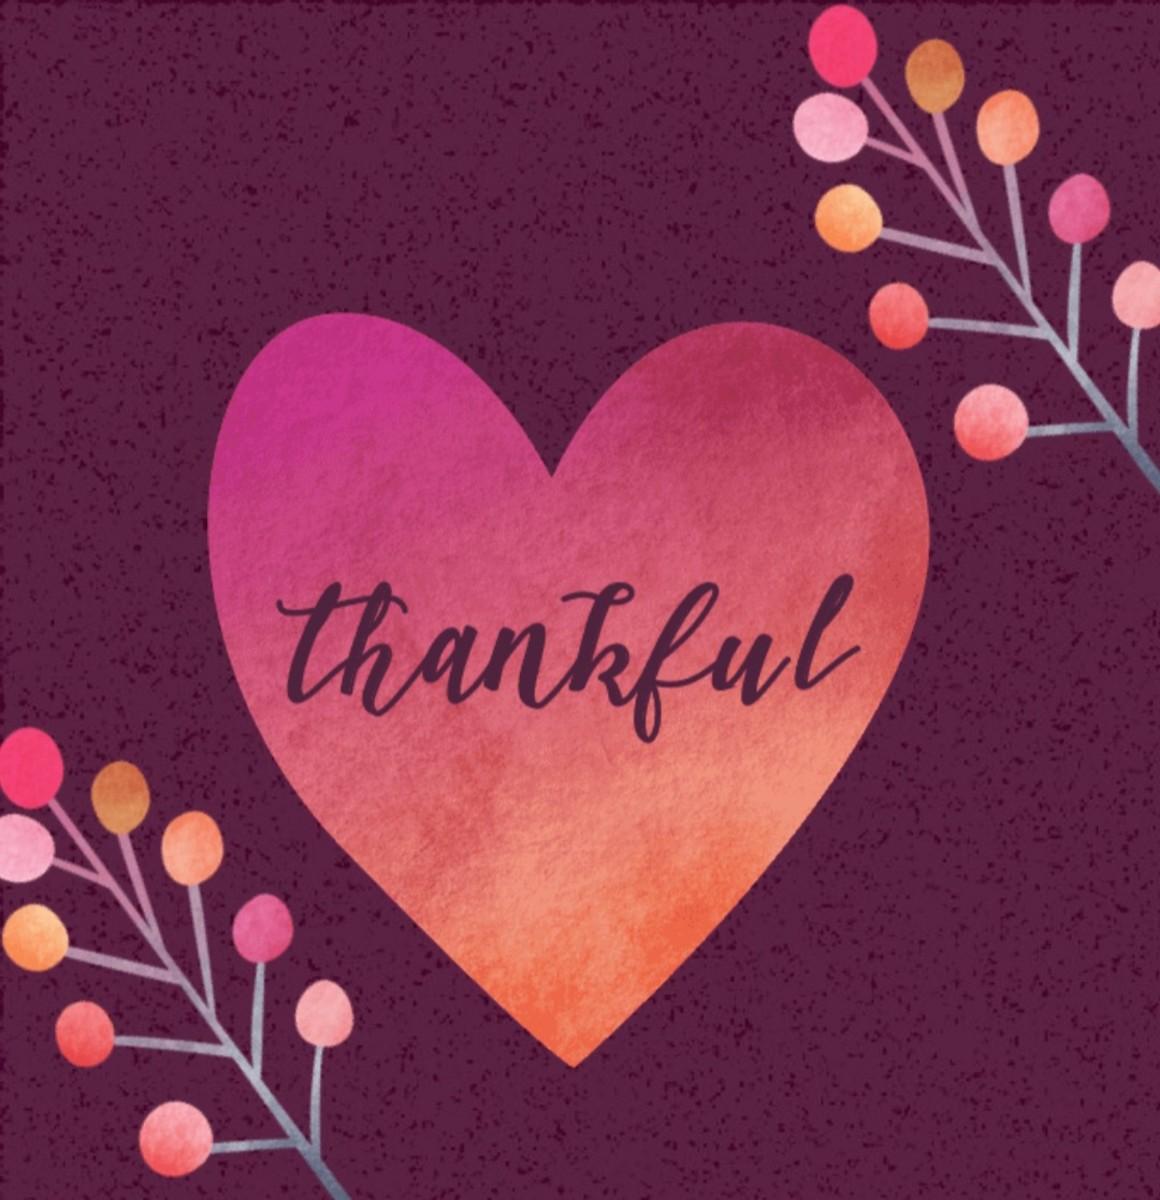 Thankful (A Thanksgiving Poem)